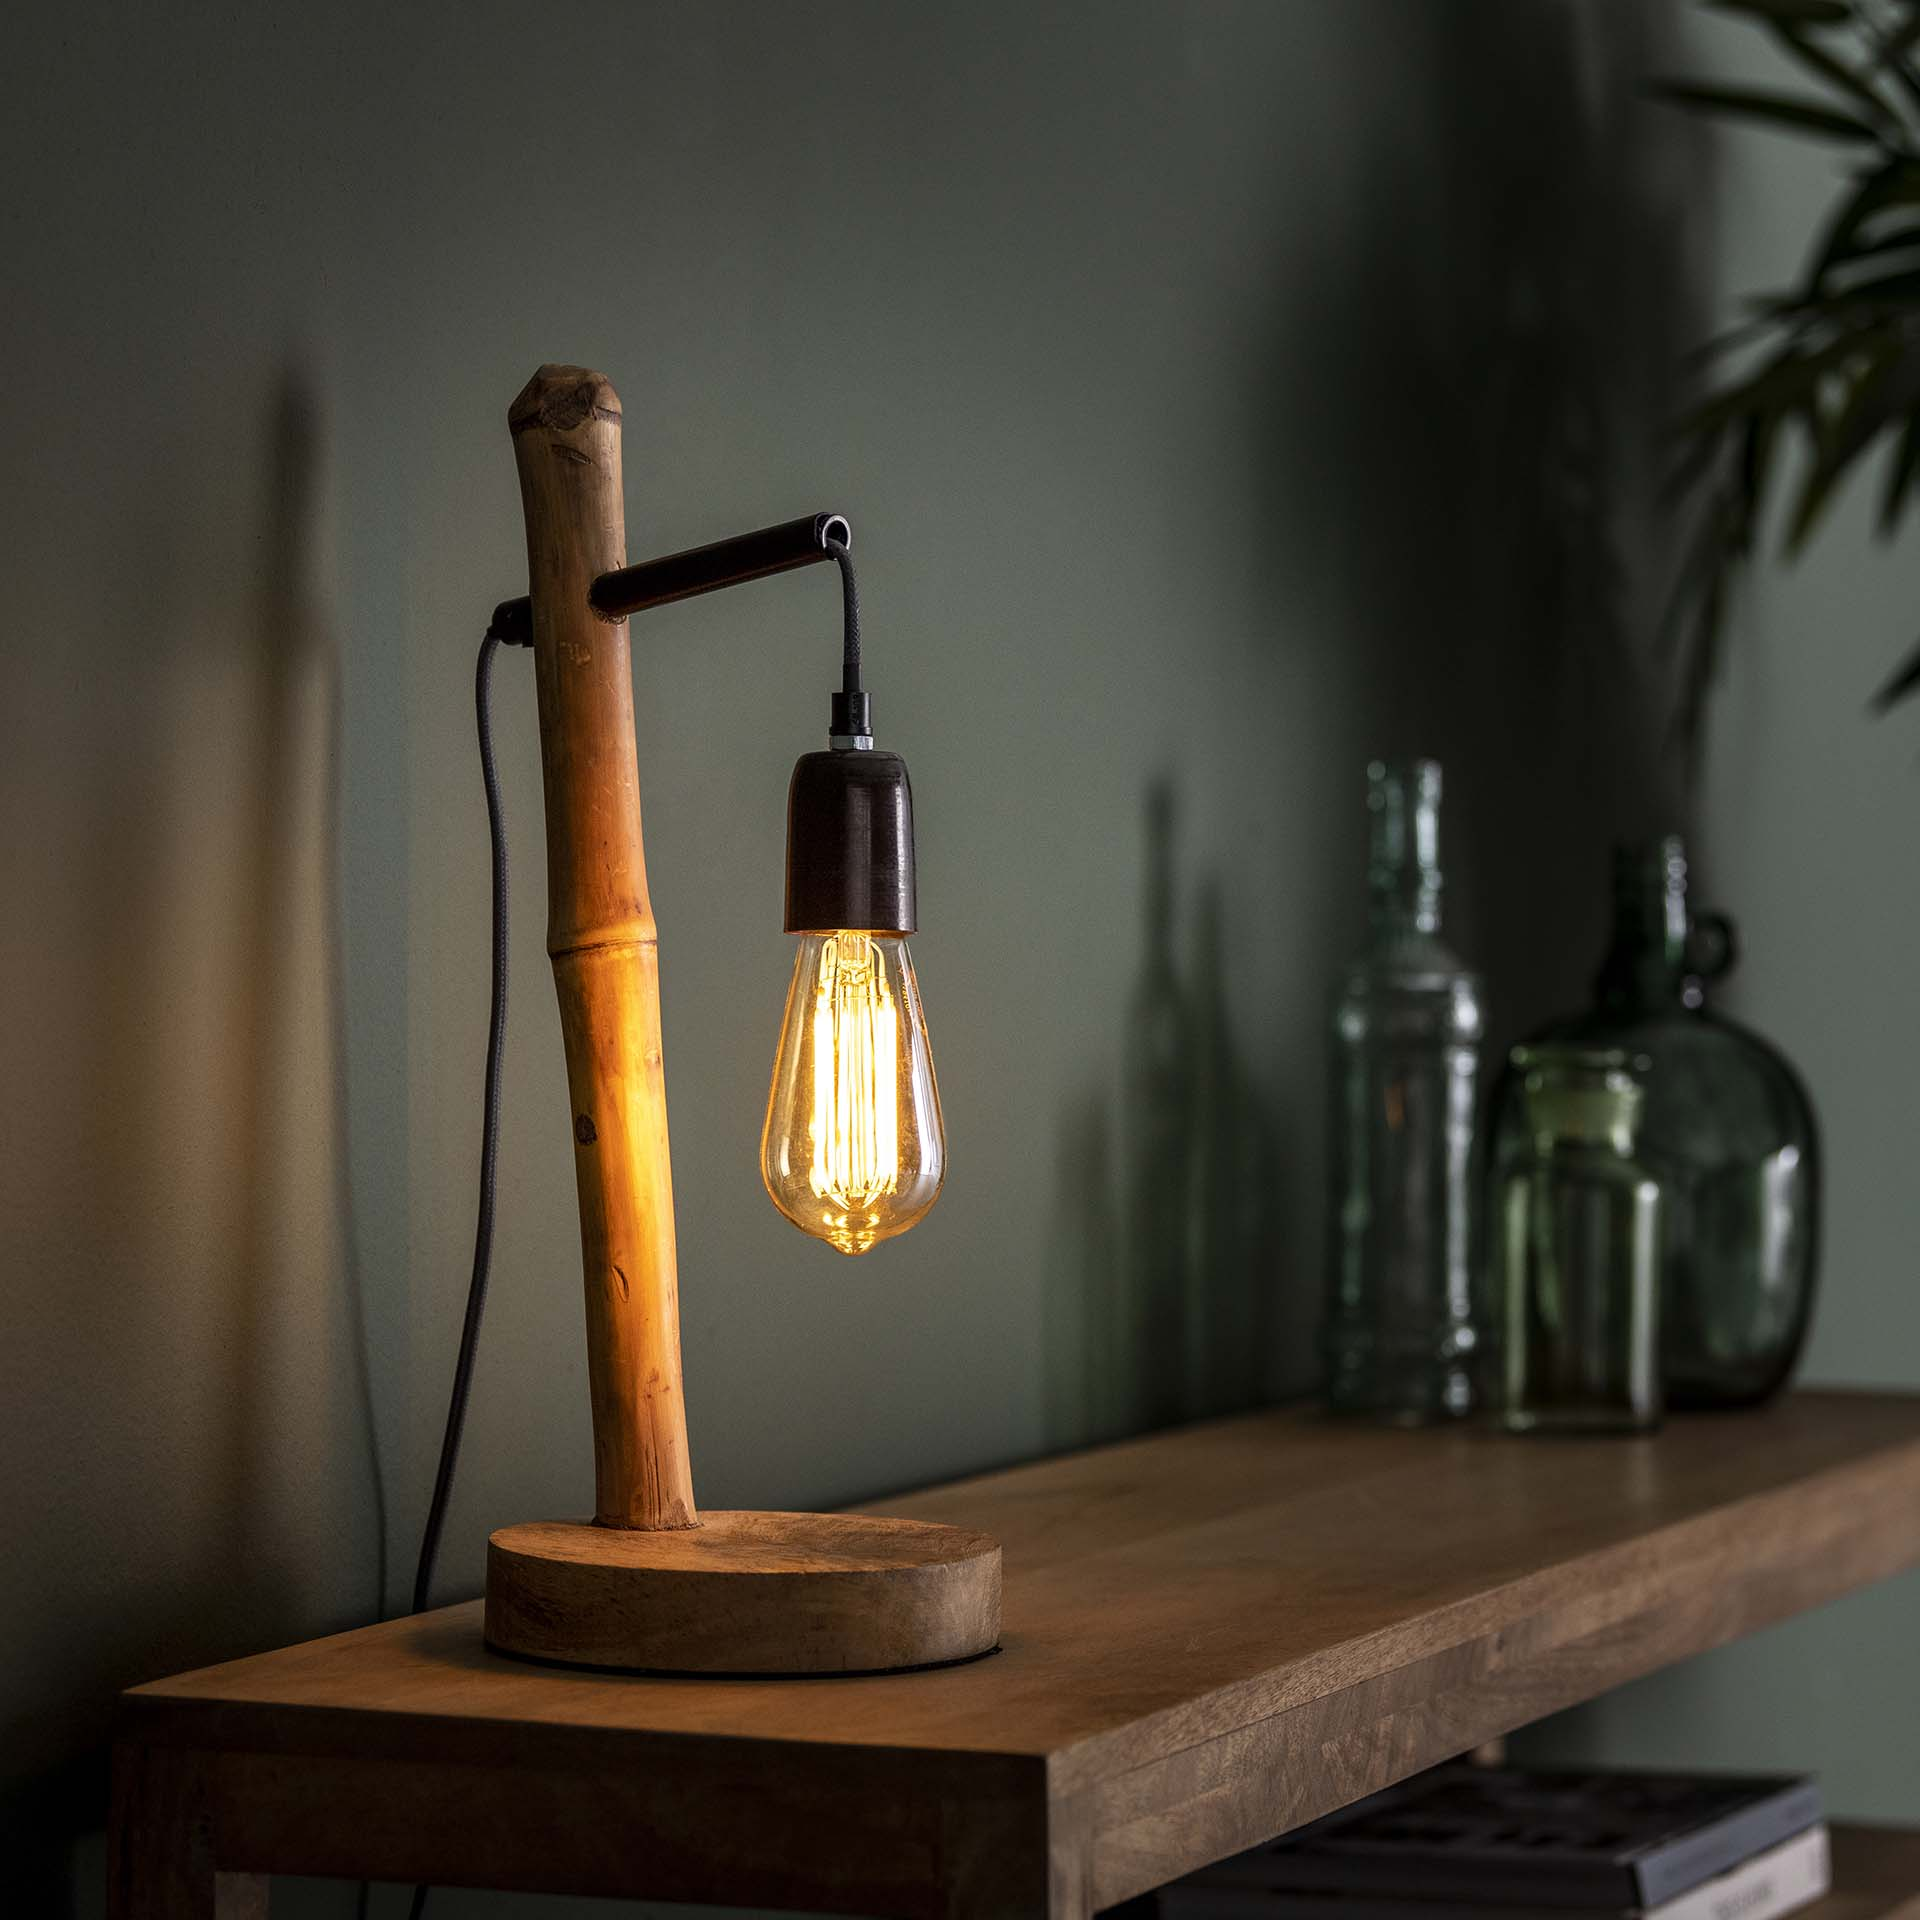 Picture of: Bamboo Bordlampe I Bambus Og Metal Bordlamper 3 Nordic